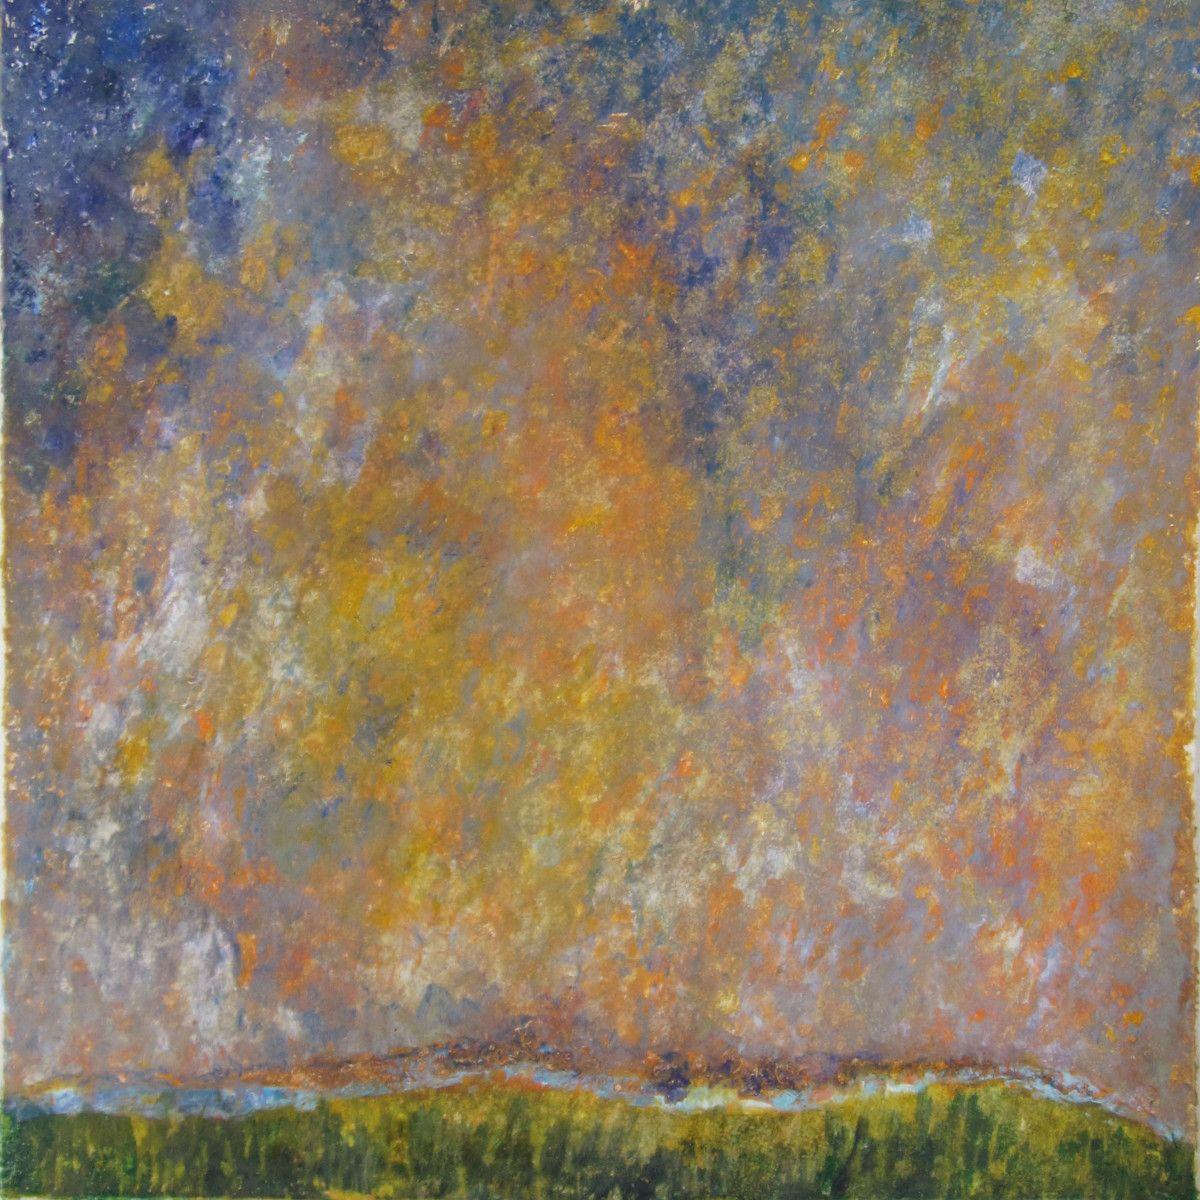 Maria Hughes. Landscape VII, Monotype, 20 x 20 in. .